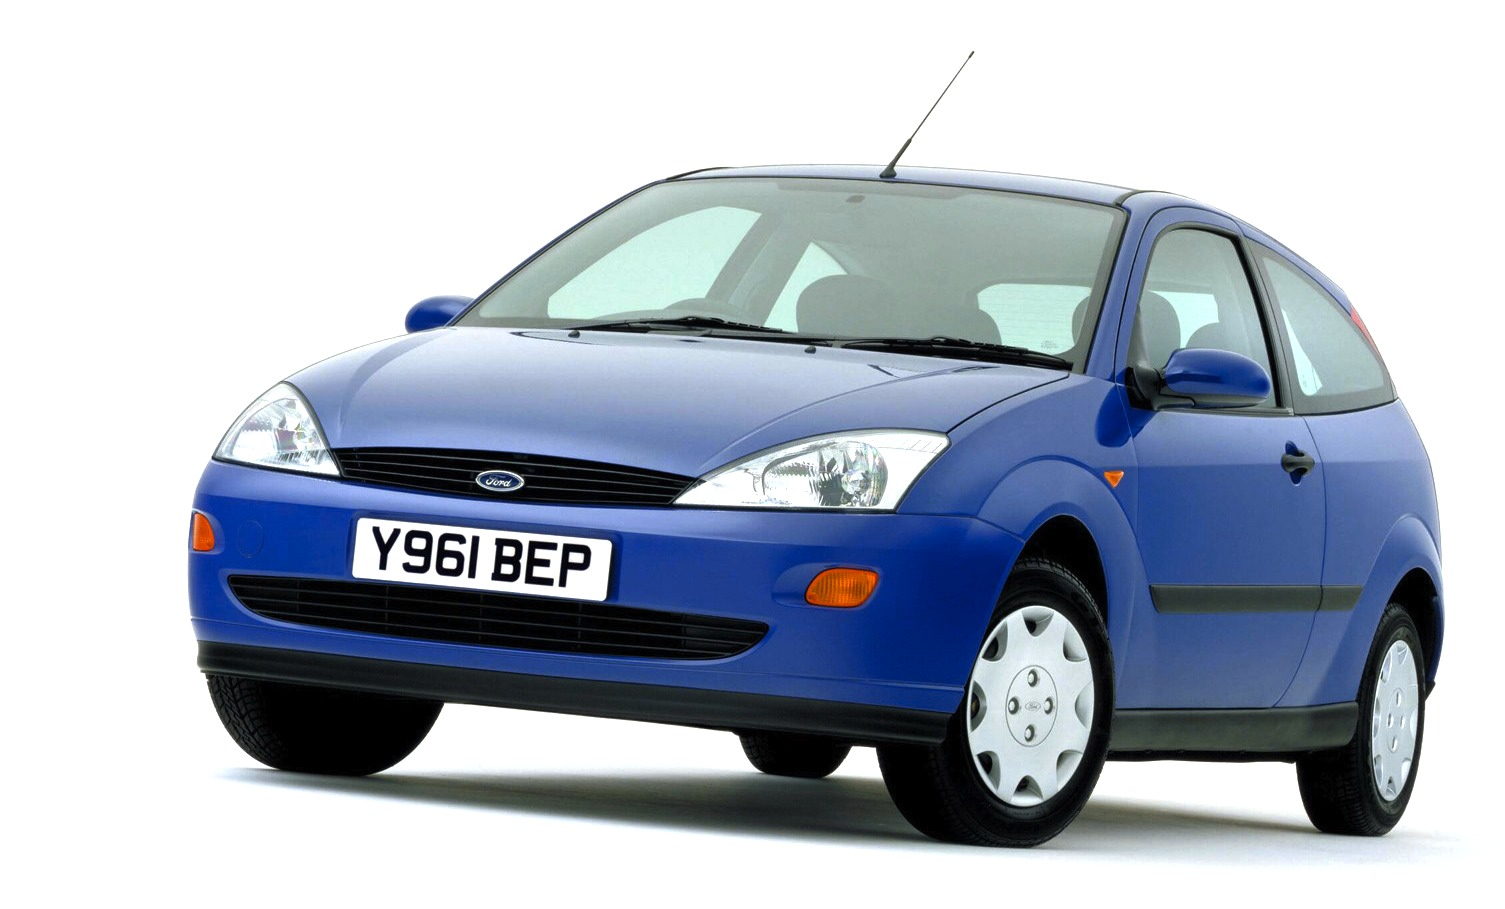 ford-focus-mk-1-drivers-side-headlight-o-s-1999-2001-new-lamp-light-[4]-963-p